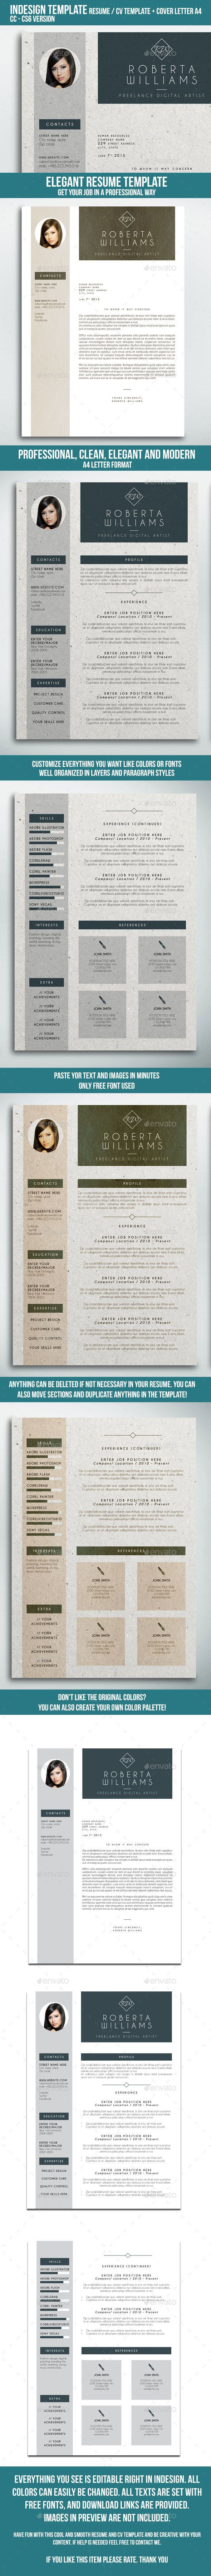 Professional Resume Cv Indesign Template Pinterest Indesign